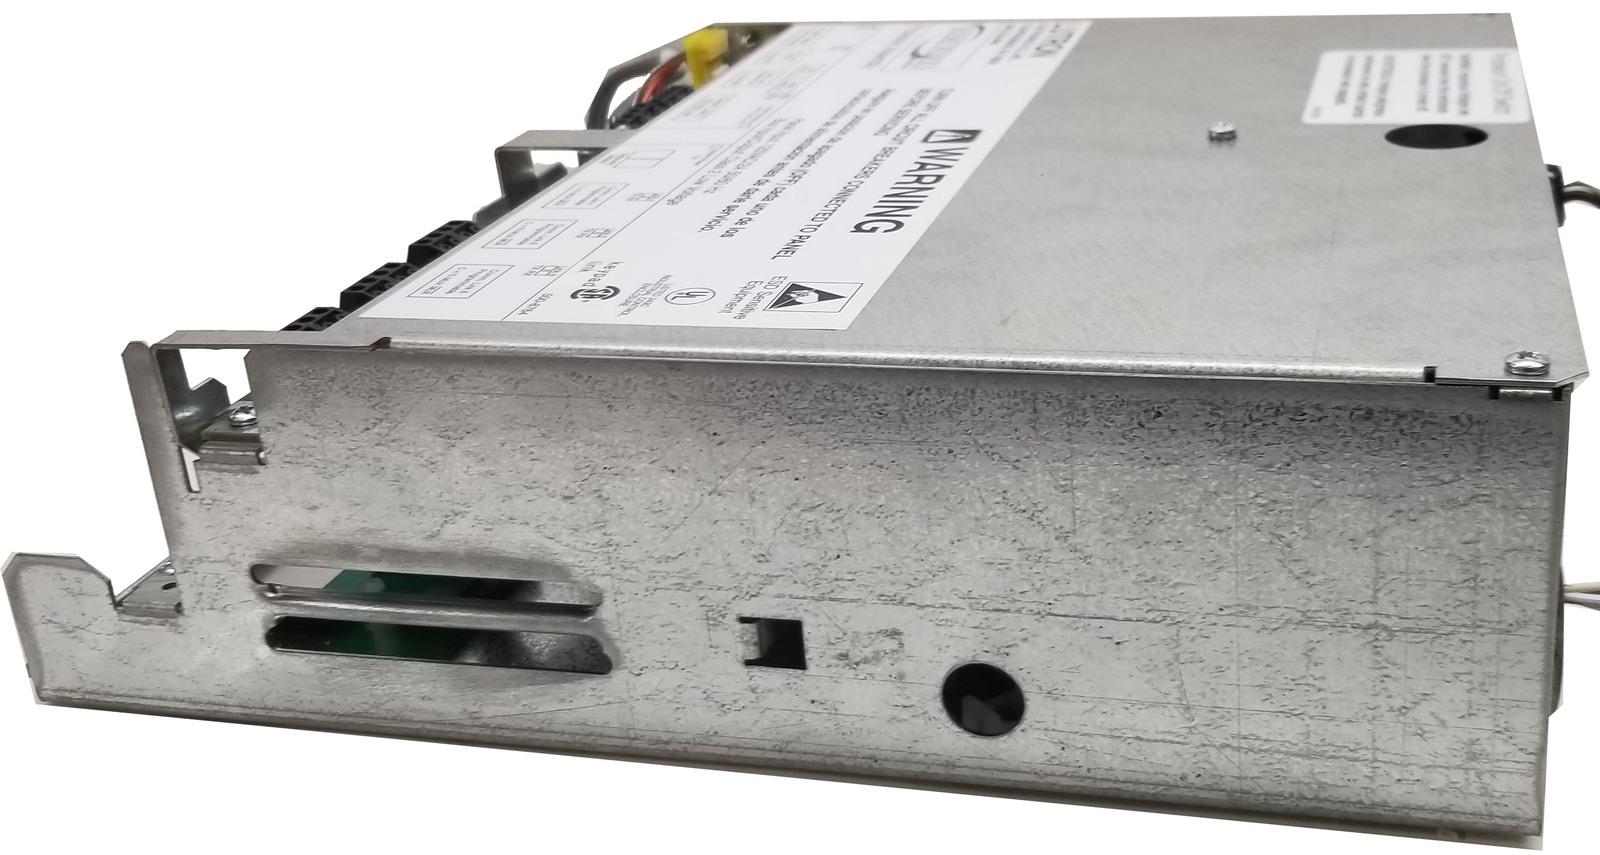 Lutron HomeWorks HWI-PM-120 Processor Assembly Bin:6